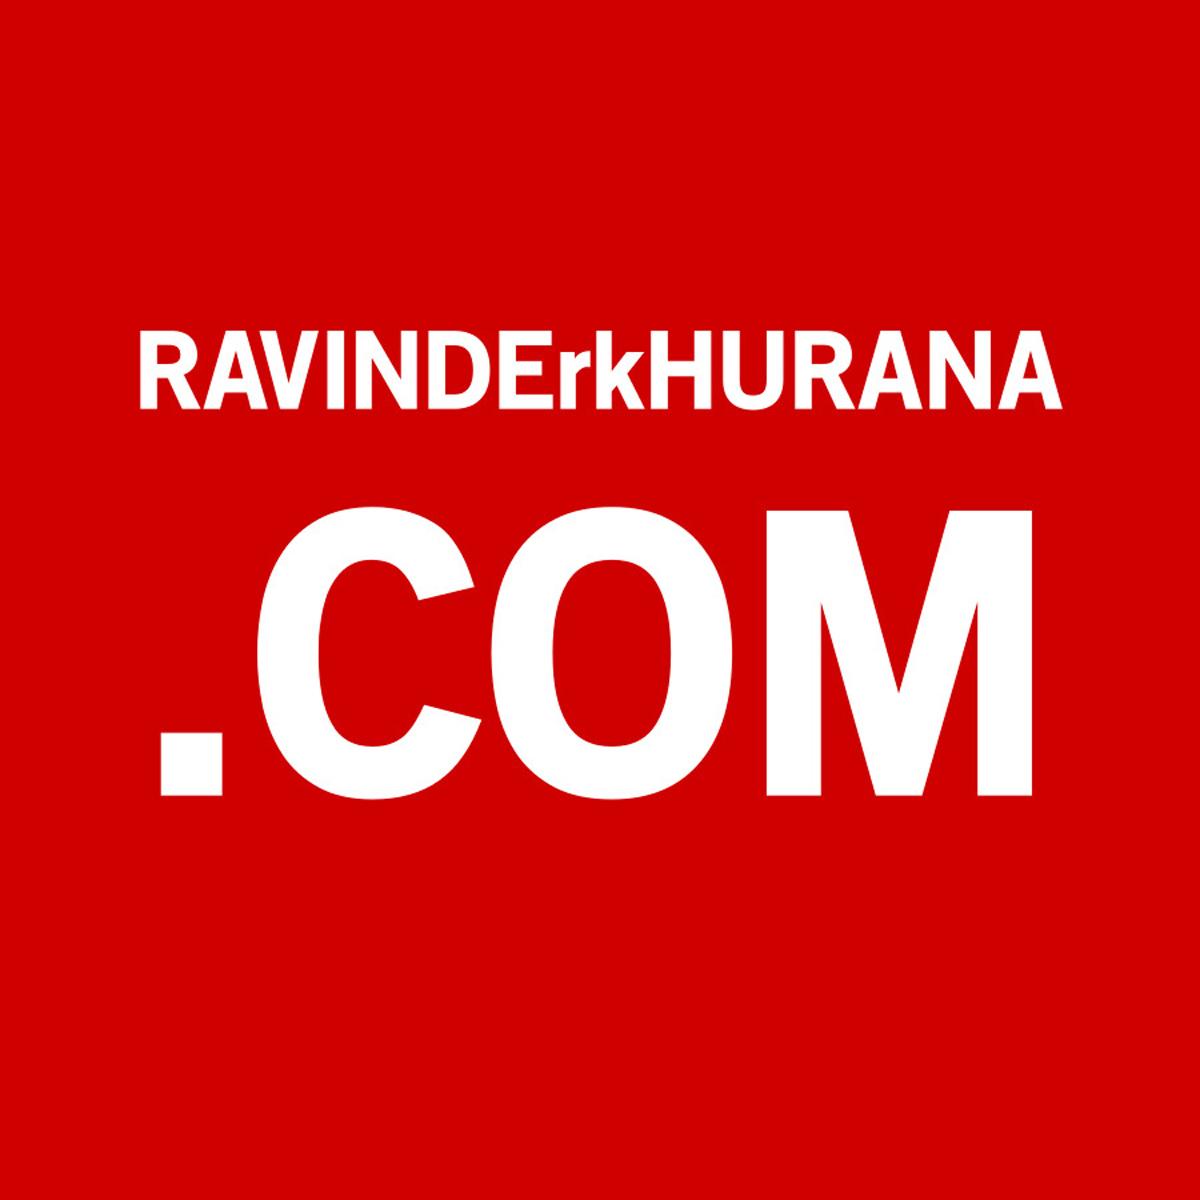 RAVINDErkHURANA.COM